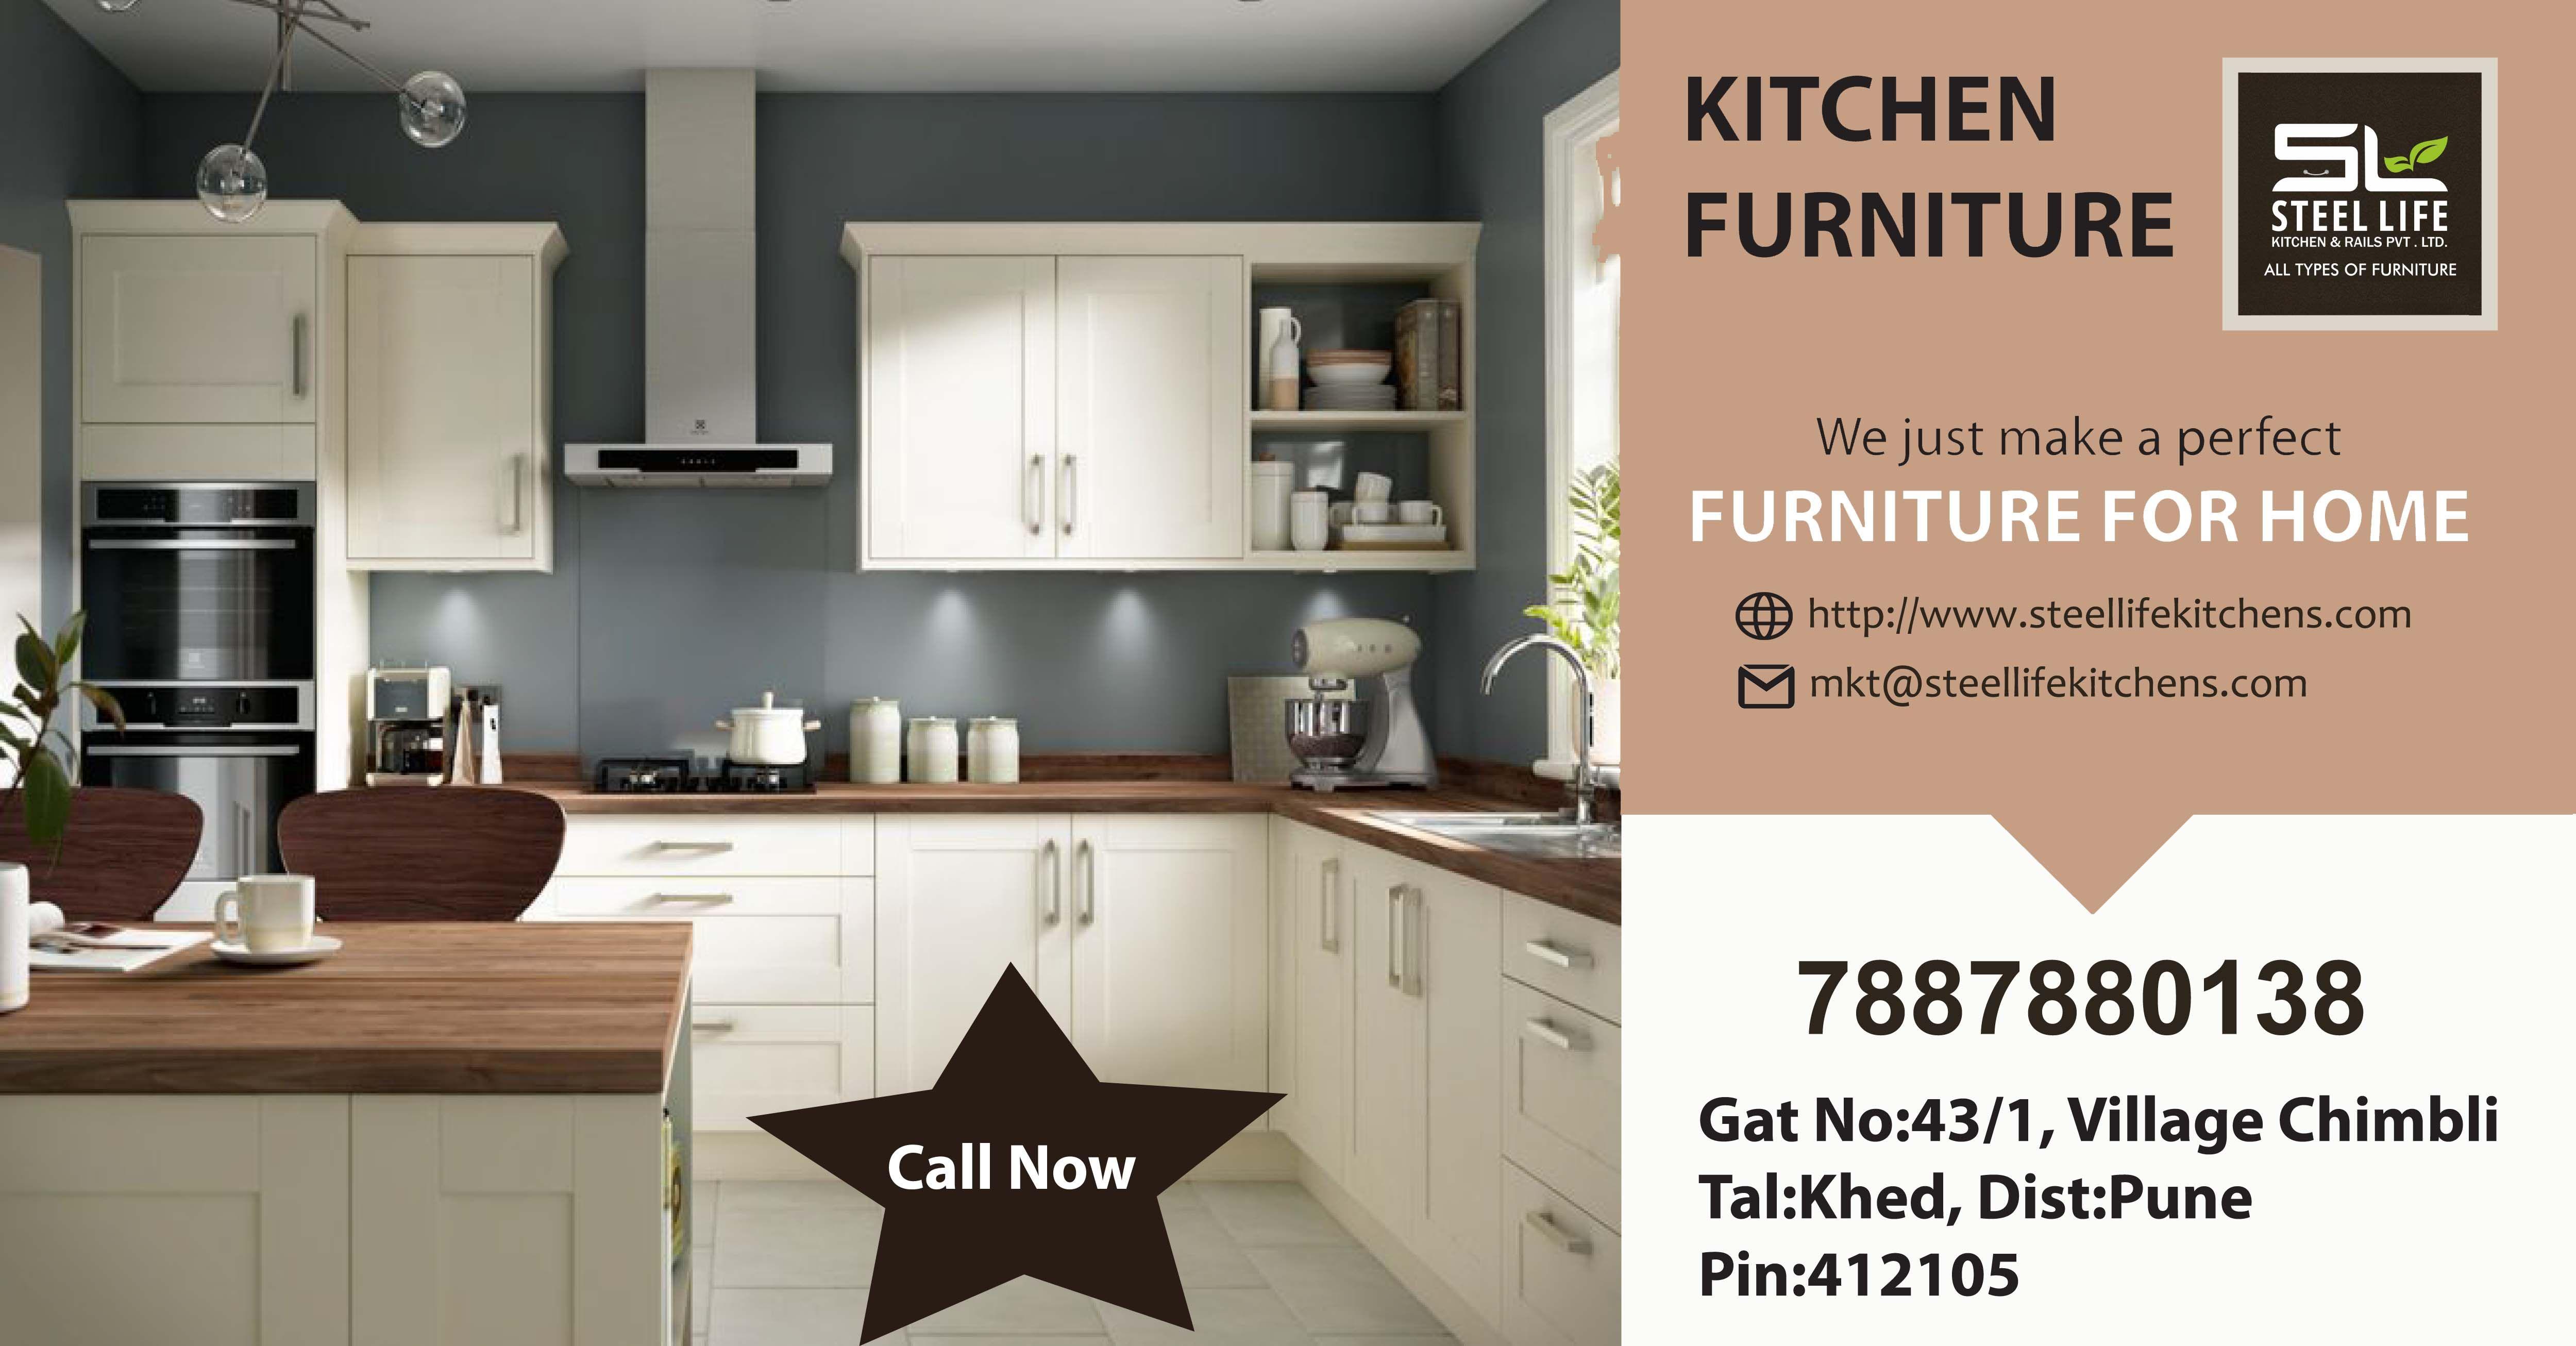 Steel Life Kitchens Rails Pvt Ltd Make A Perfect Furniture For